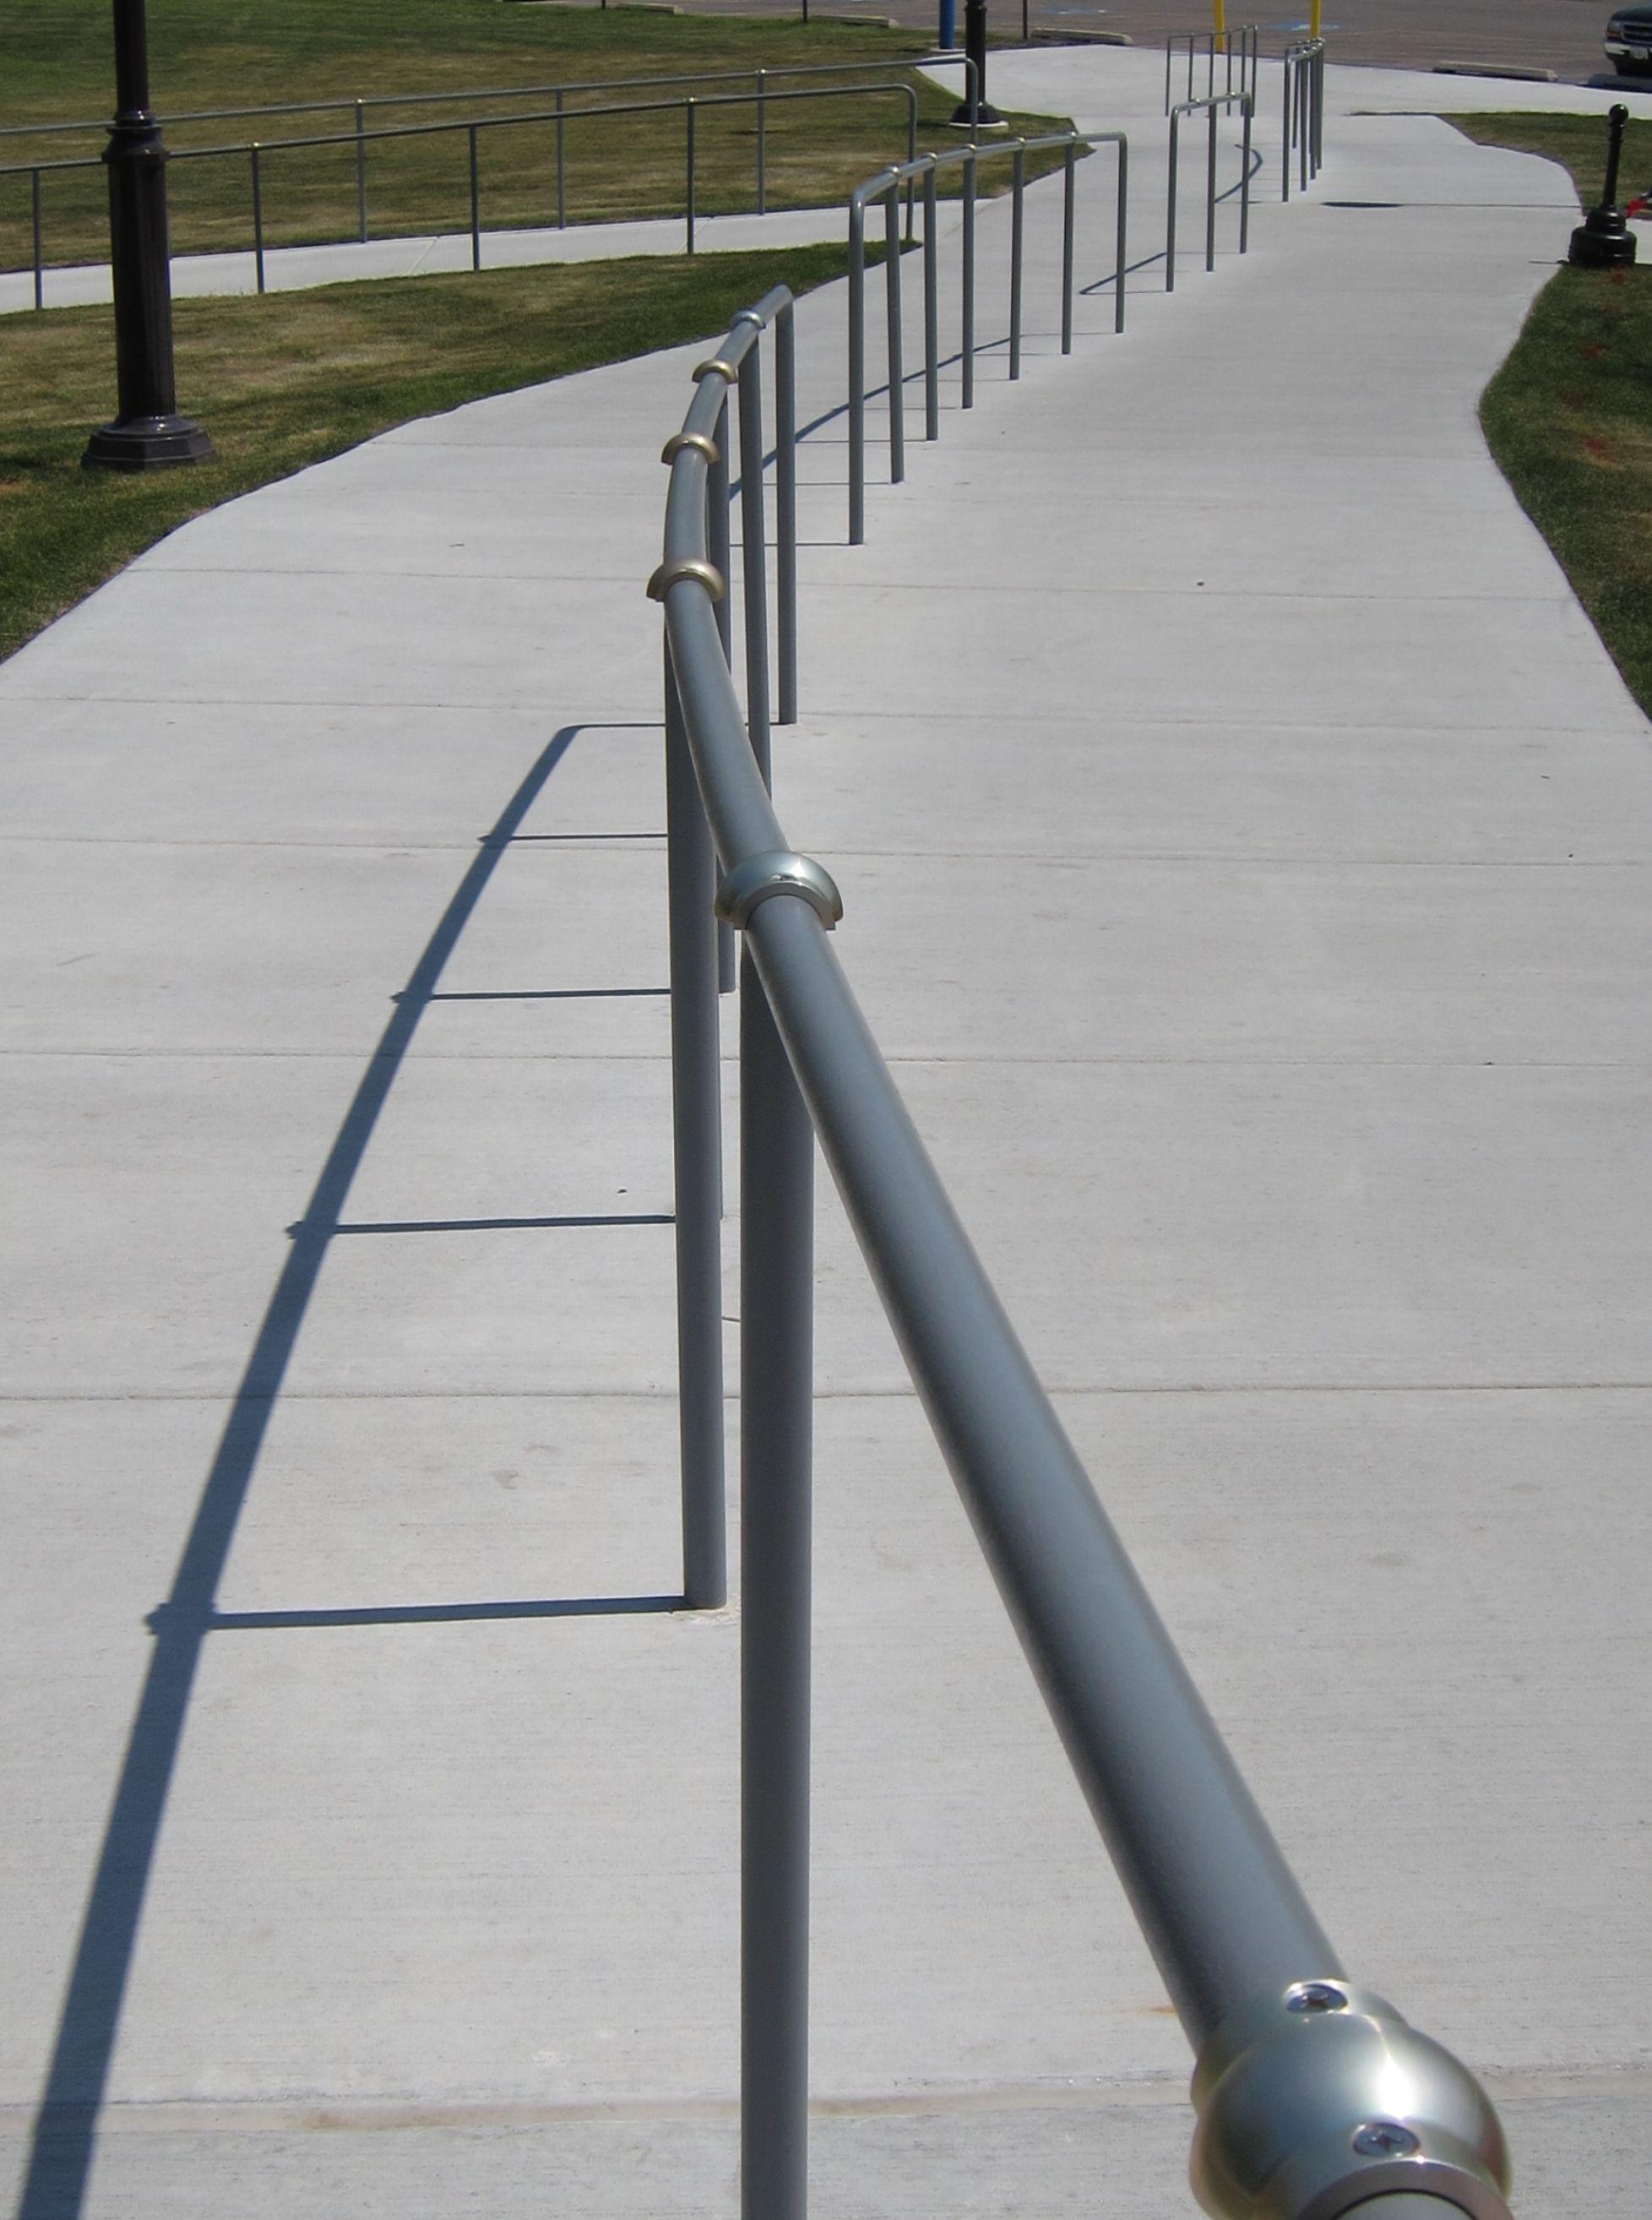 Best Handrail Minders Skateboard Deterrents Built For Round 400 x 300